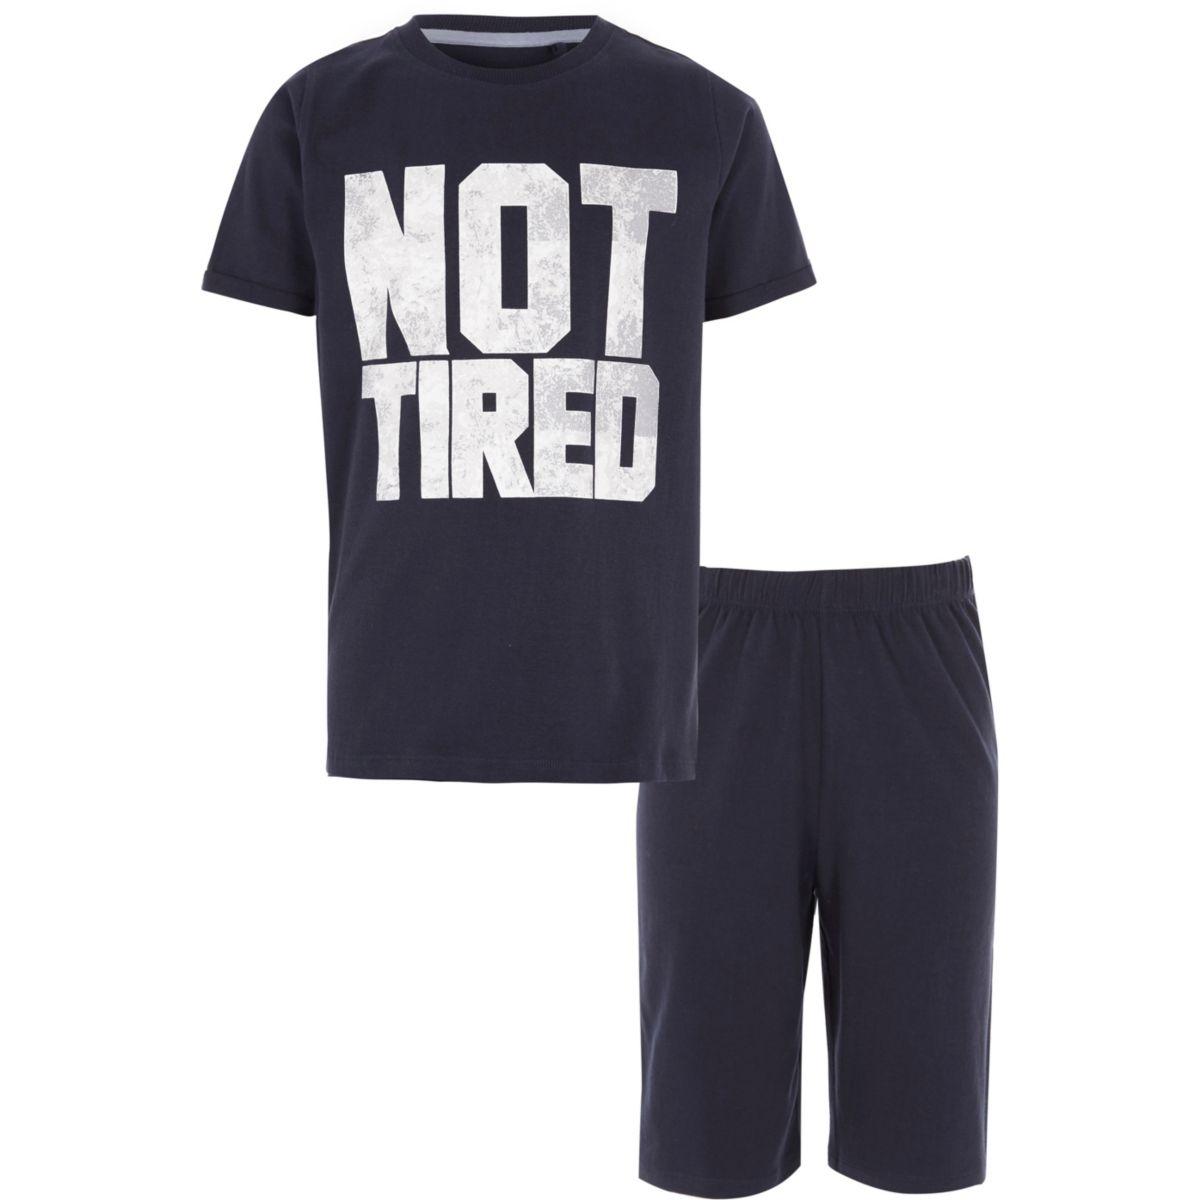 Boys navy 'not tired' print pajama set